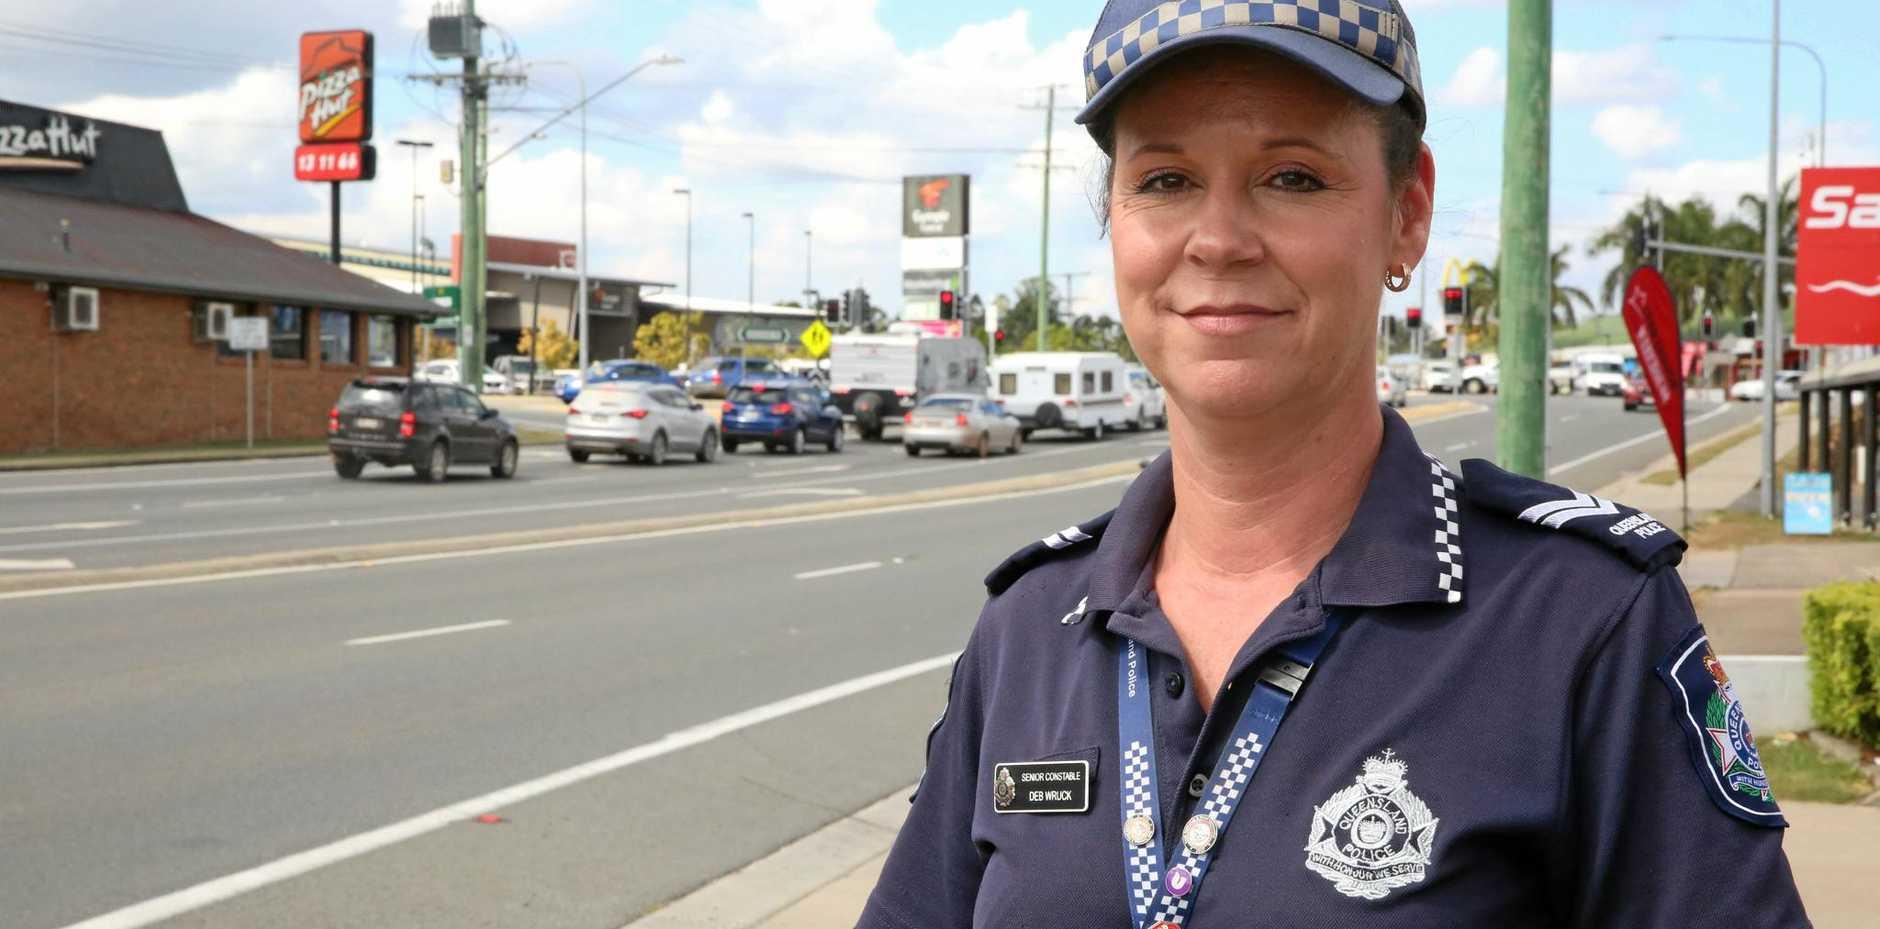 ROAD SAFETY WEEK: Senior Constable Debra Wruck